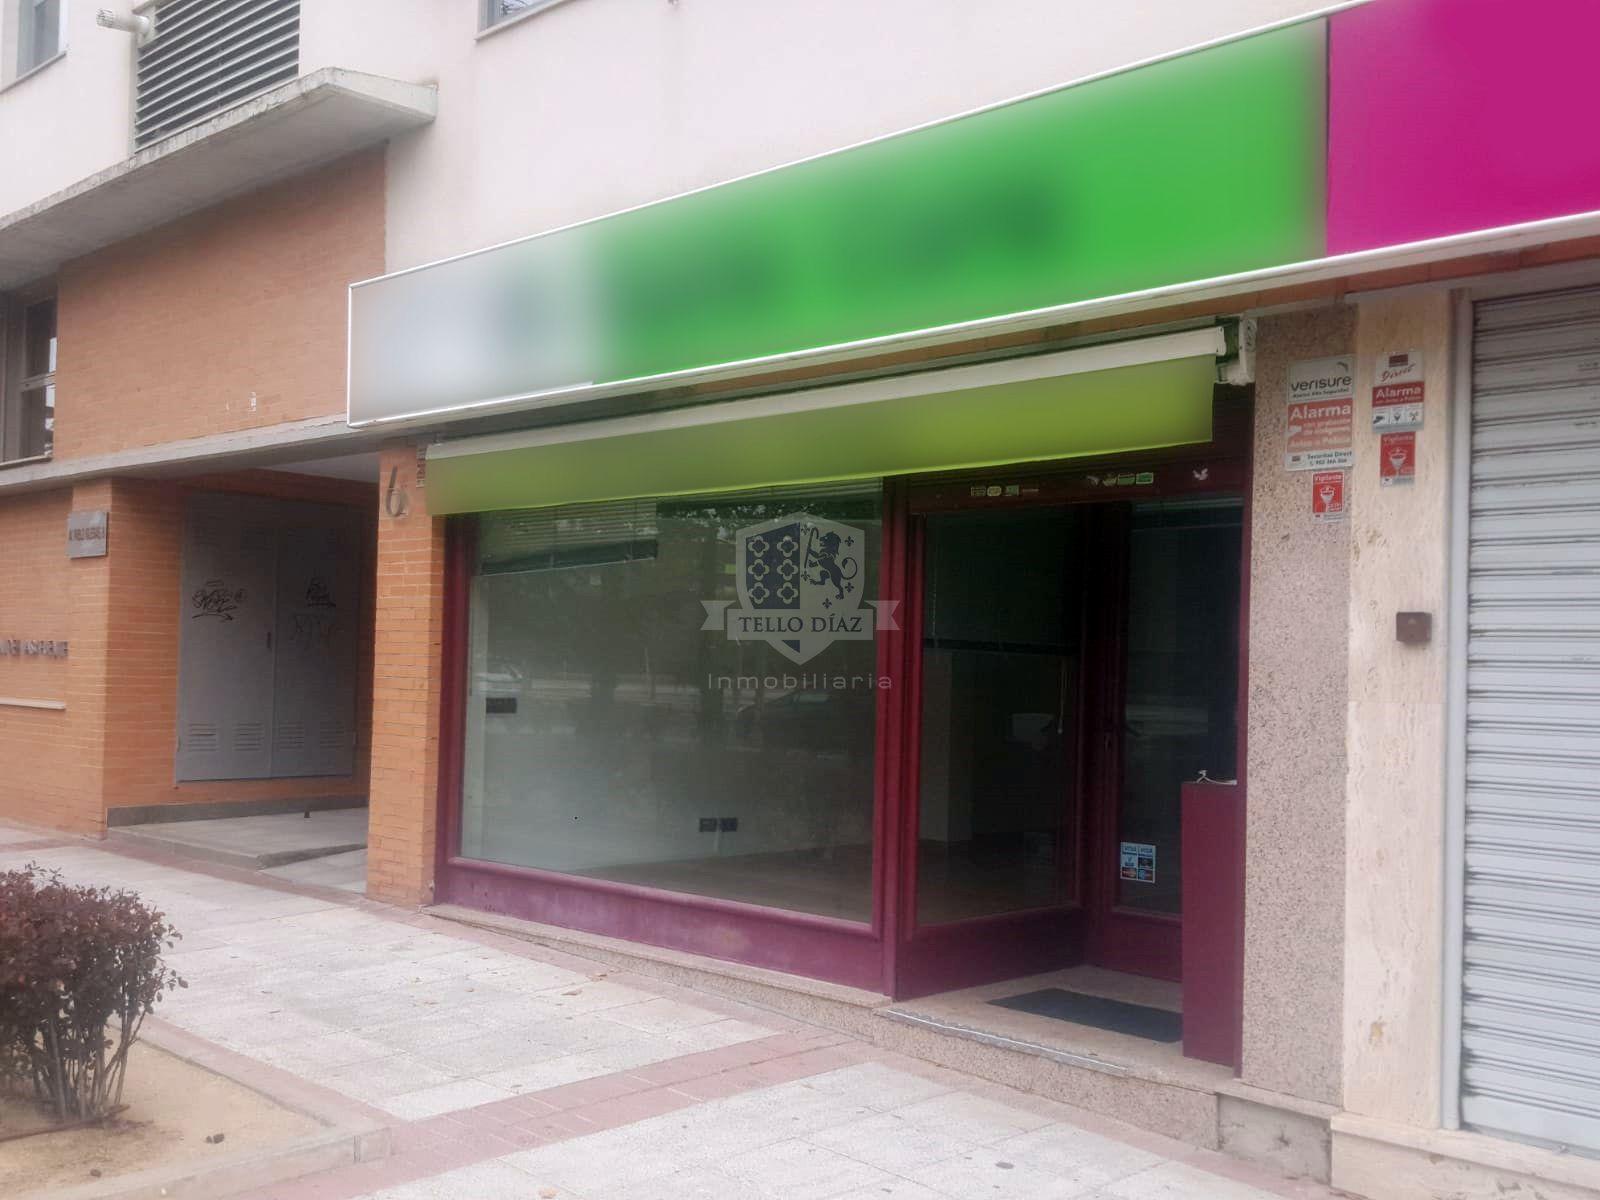 Local comercial en Alcobendas, Norte, alquiler